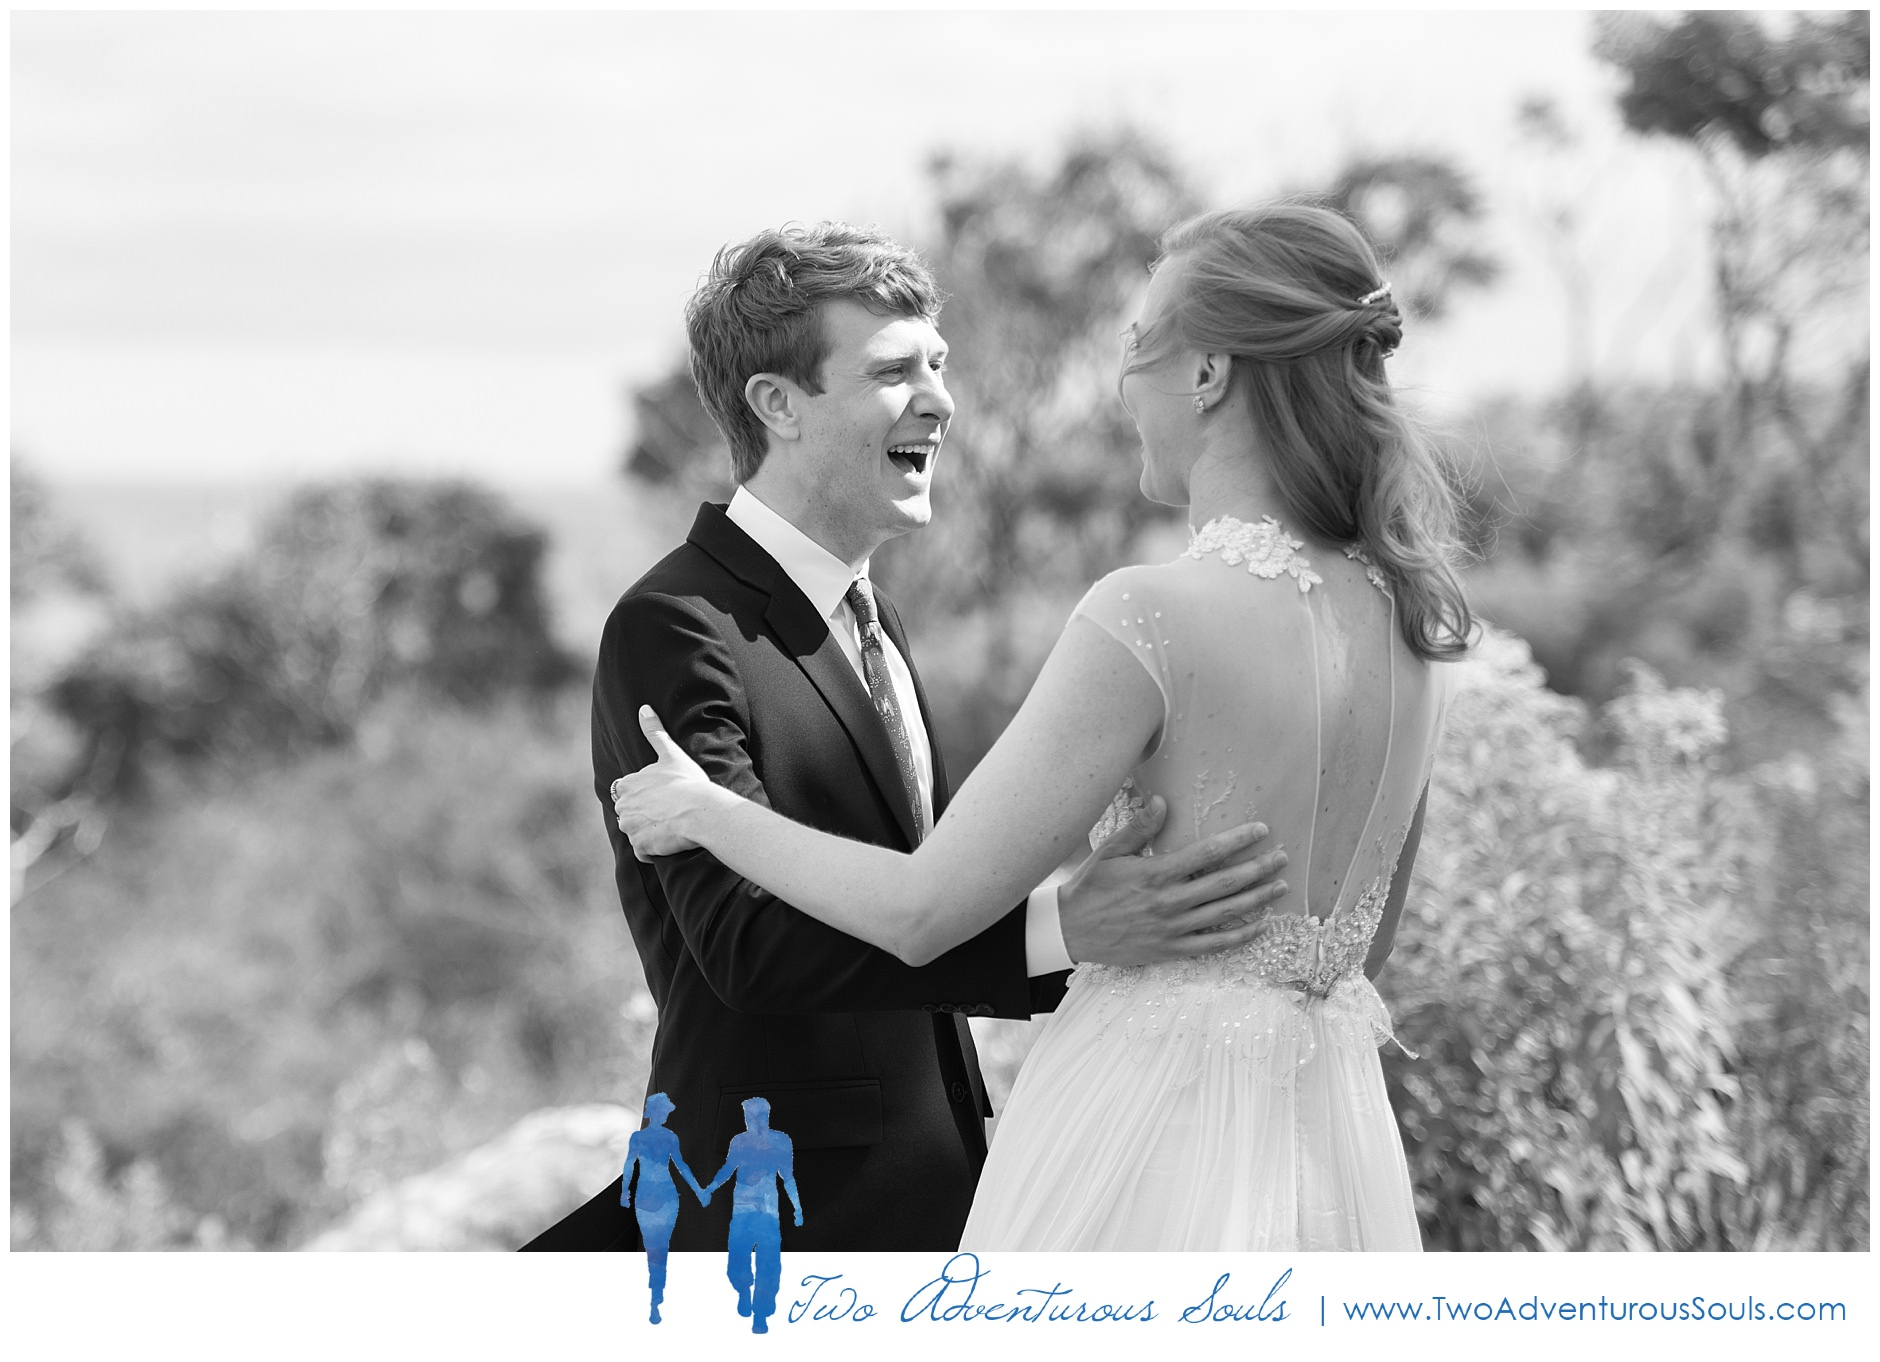 Grace Maine Photographers, Portland Maine Wedding Photographers, Two Adventurous Souls- 090719_0006.jpg